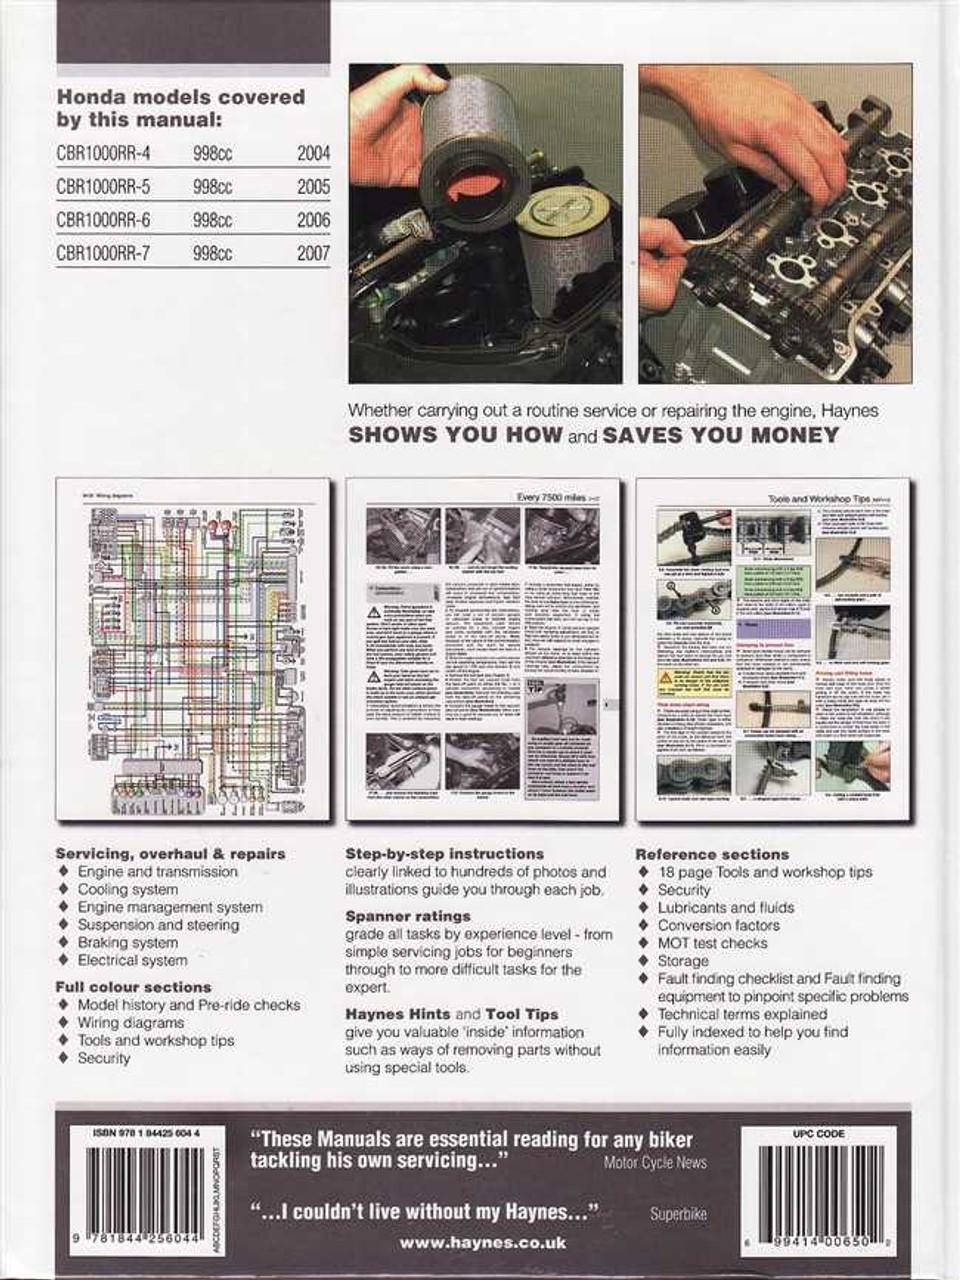 Honda CBR1000RR Fireblade 2004 to 2007 Workshop Manual on